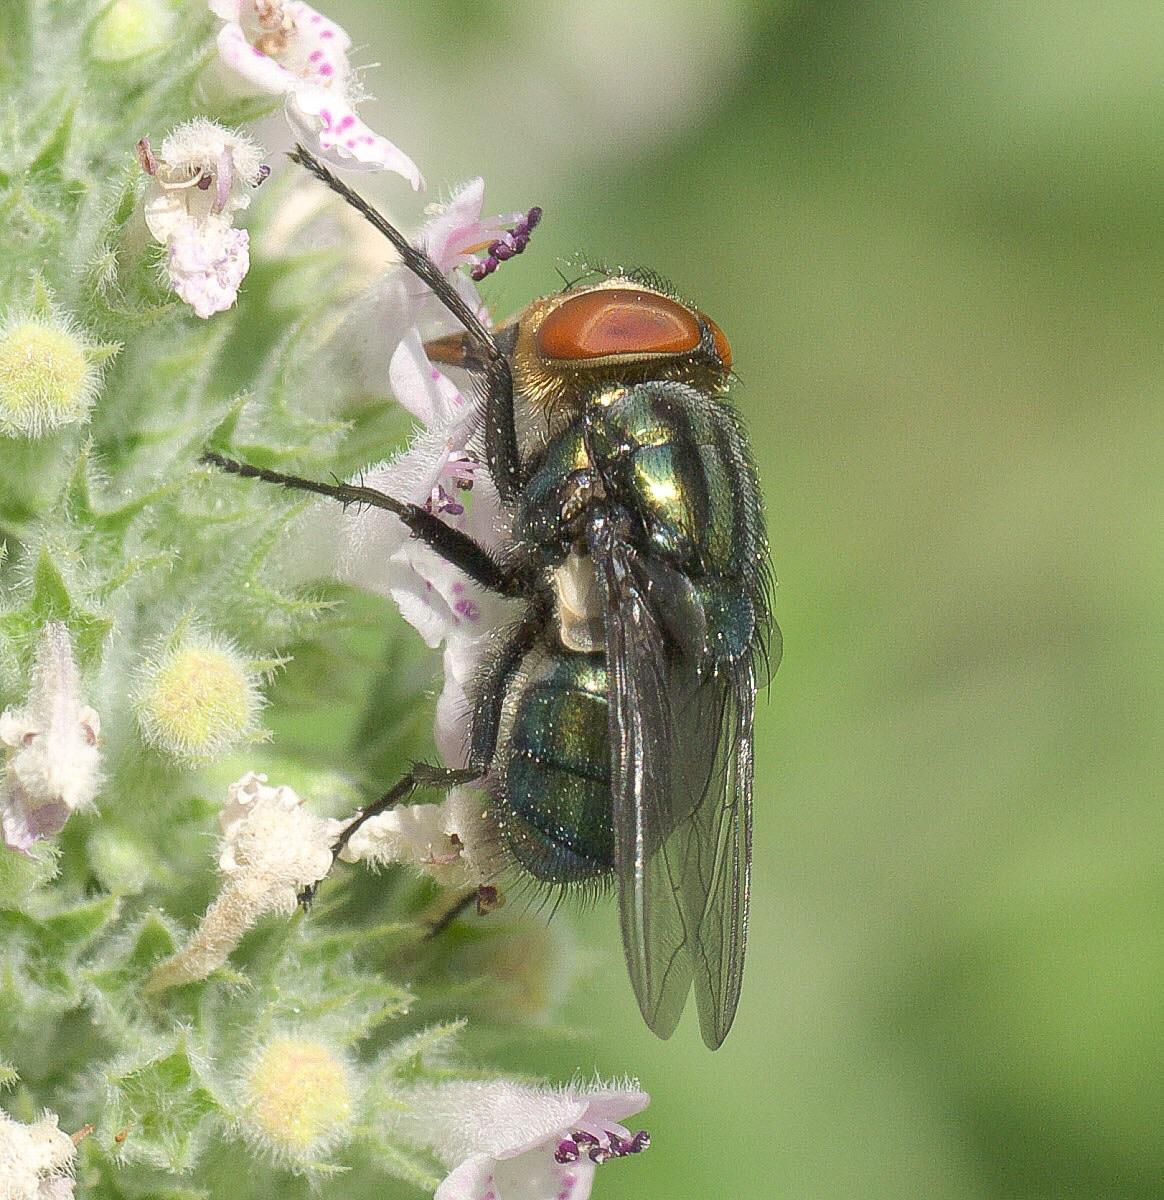 A secondary screwworm fly on a catnip plant